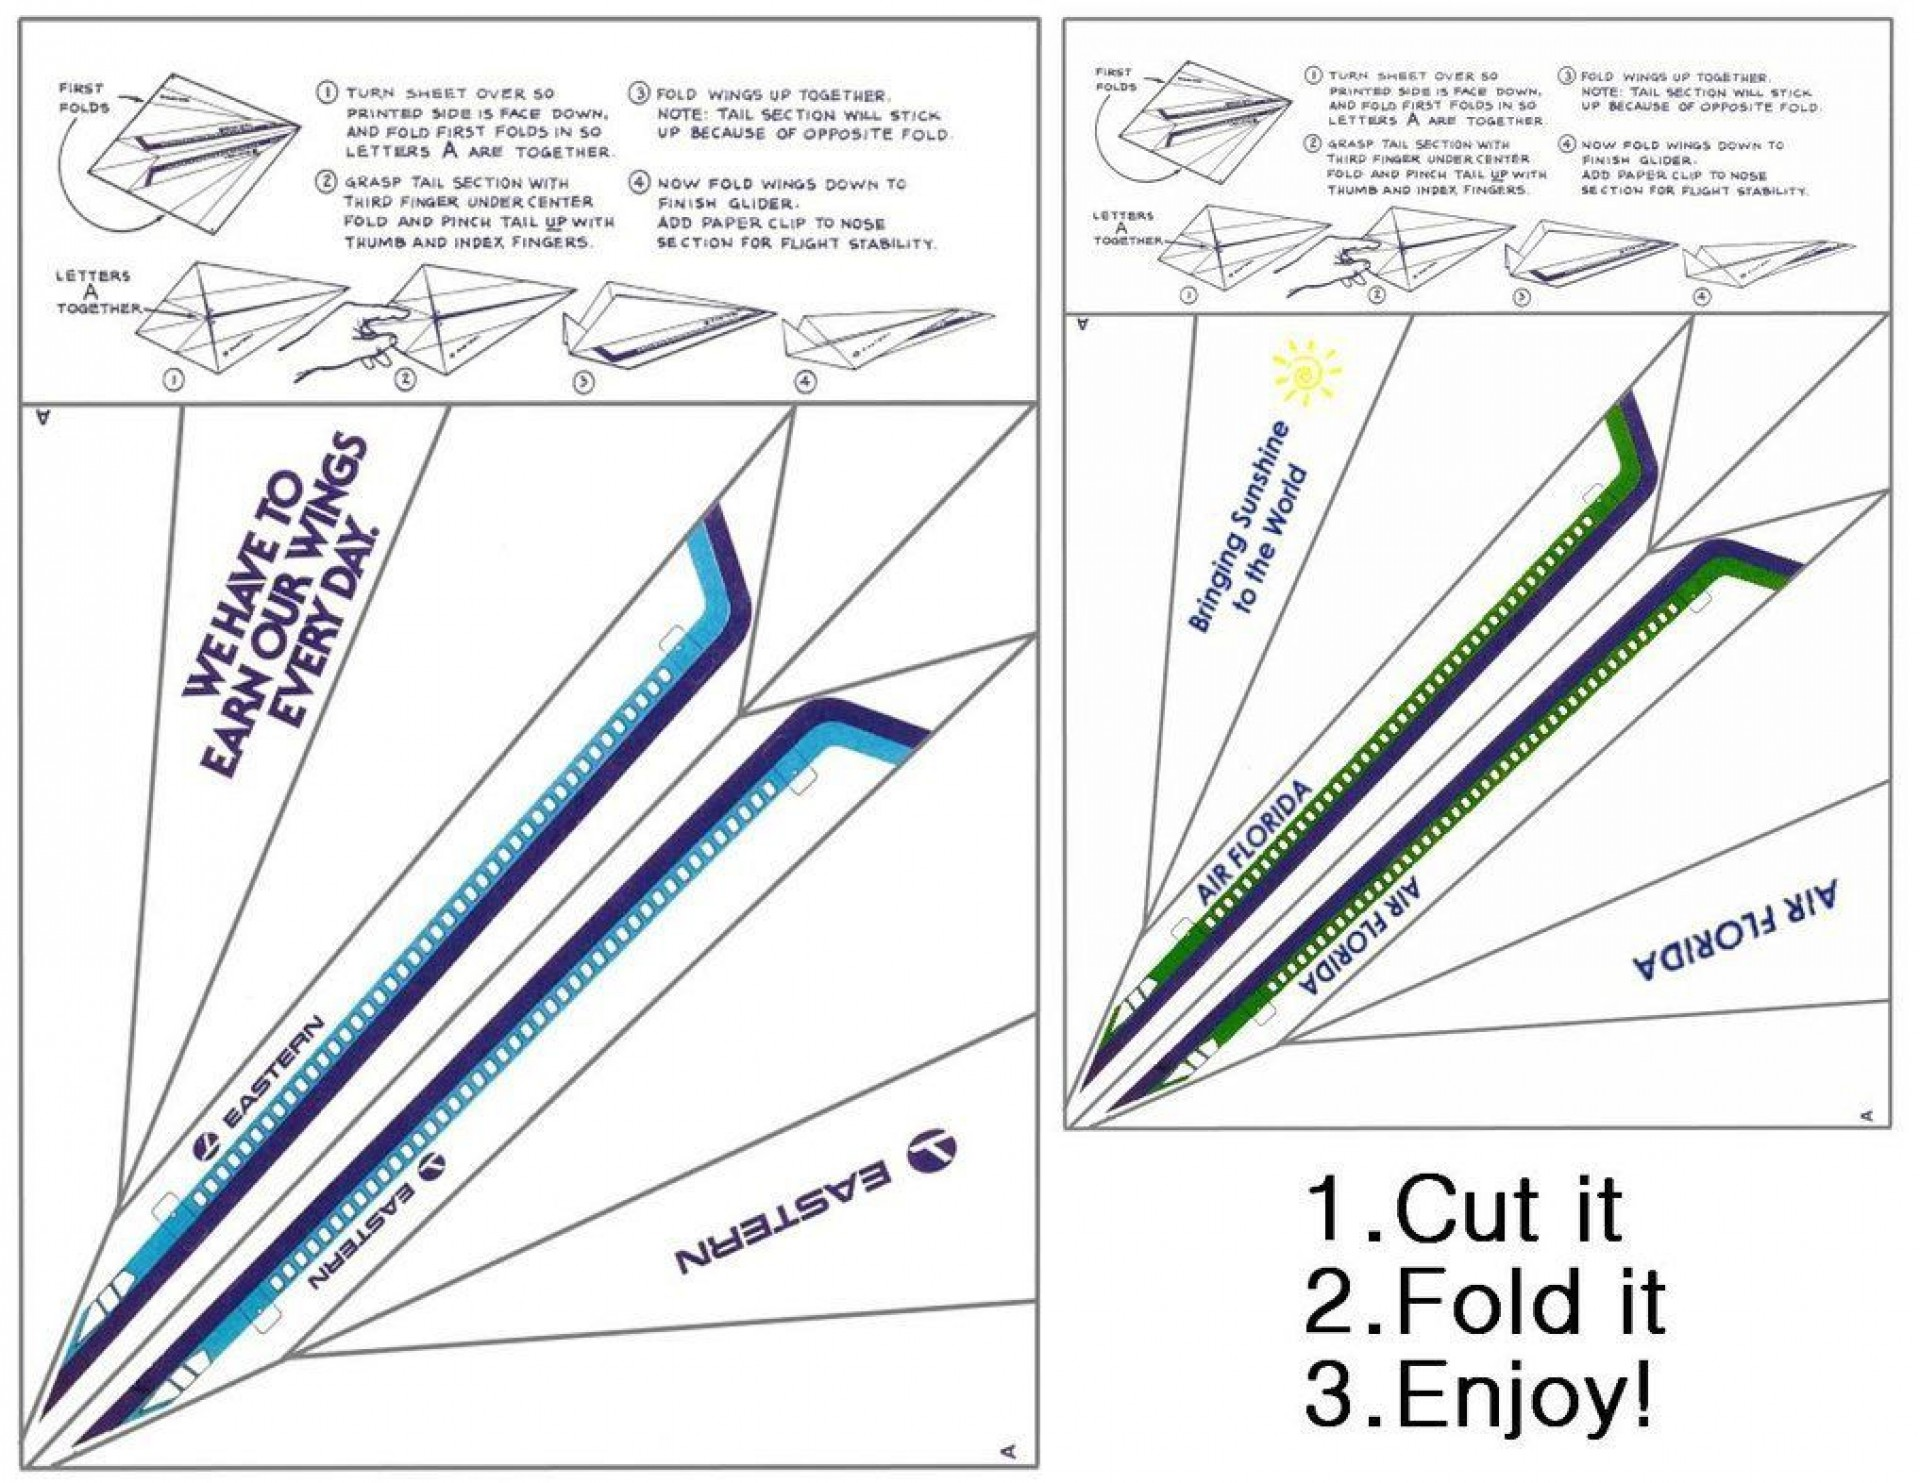 002 Marvelou Printable Paper Airplane Pattern High Def  Free Plane Design Designs-printable Template1920